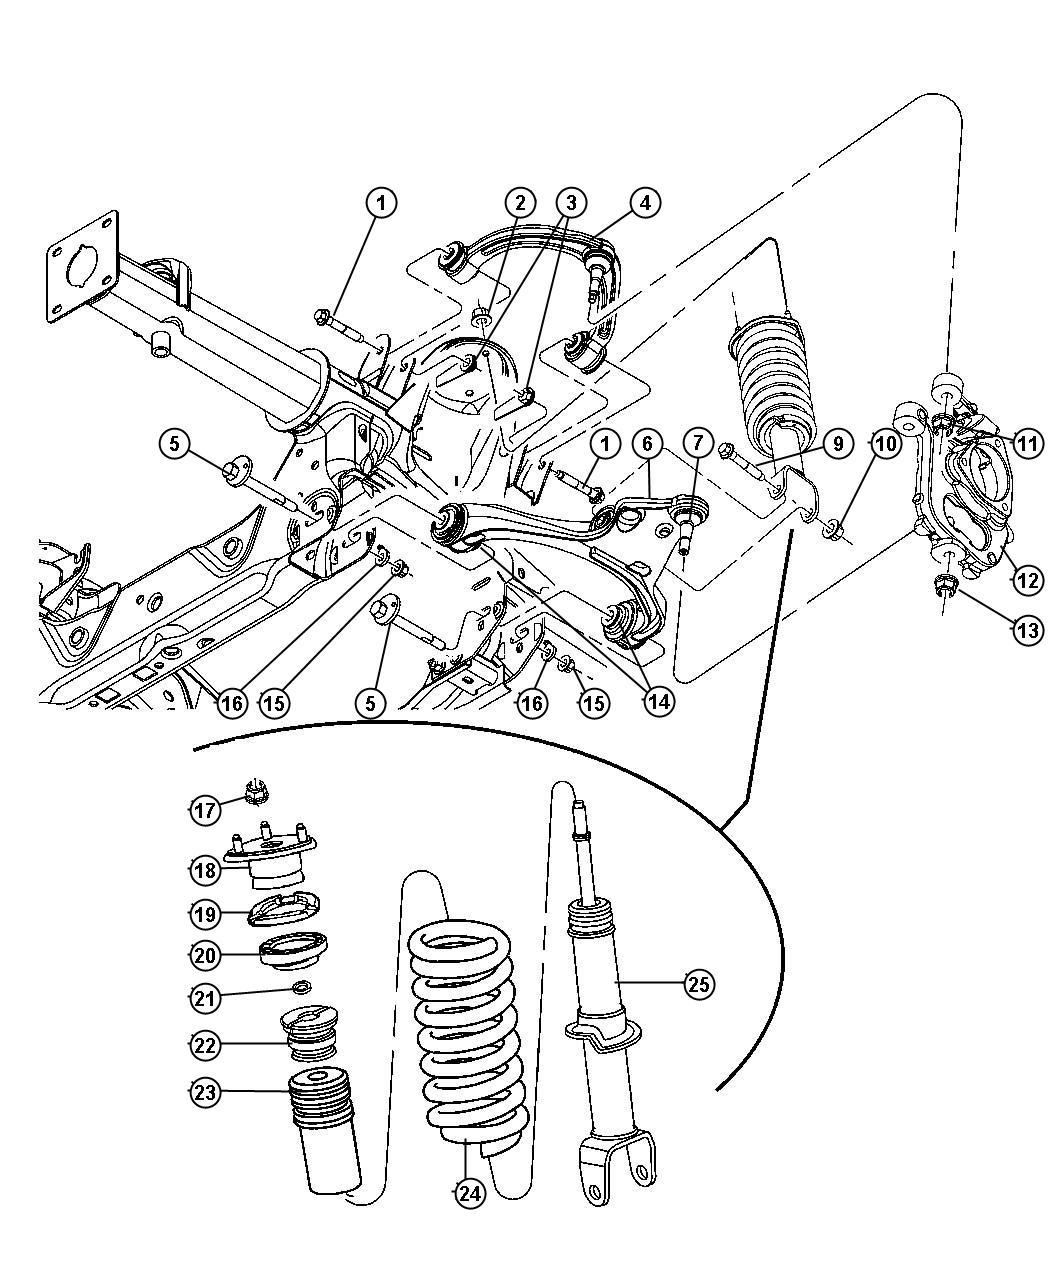 tags: #suzuki motorcycle wiring diagrams#suzuki atv wiring diagrams#2003  suzuki gsxr 750 wiring diagram#chopper wiring diagram#honda wiring diagram#ignition